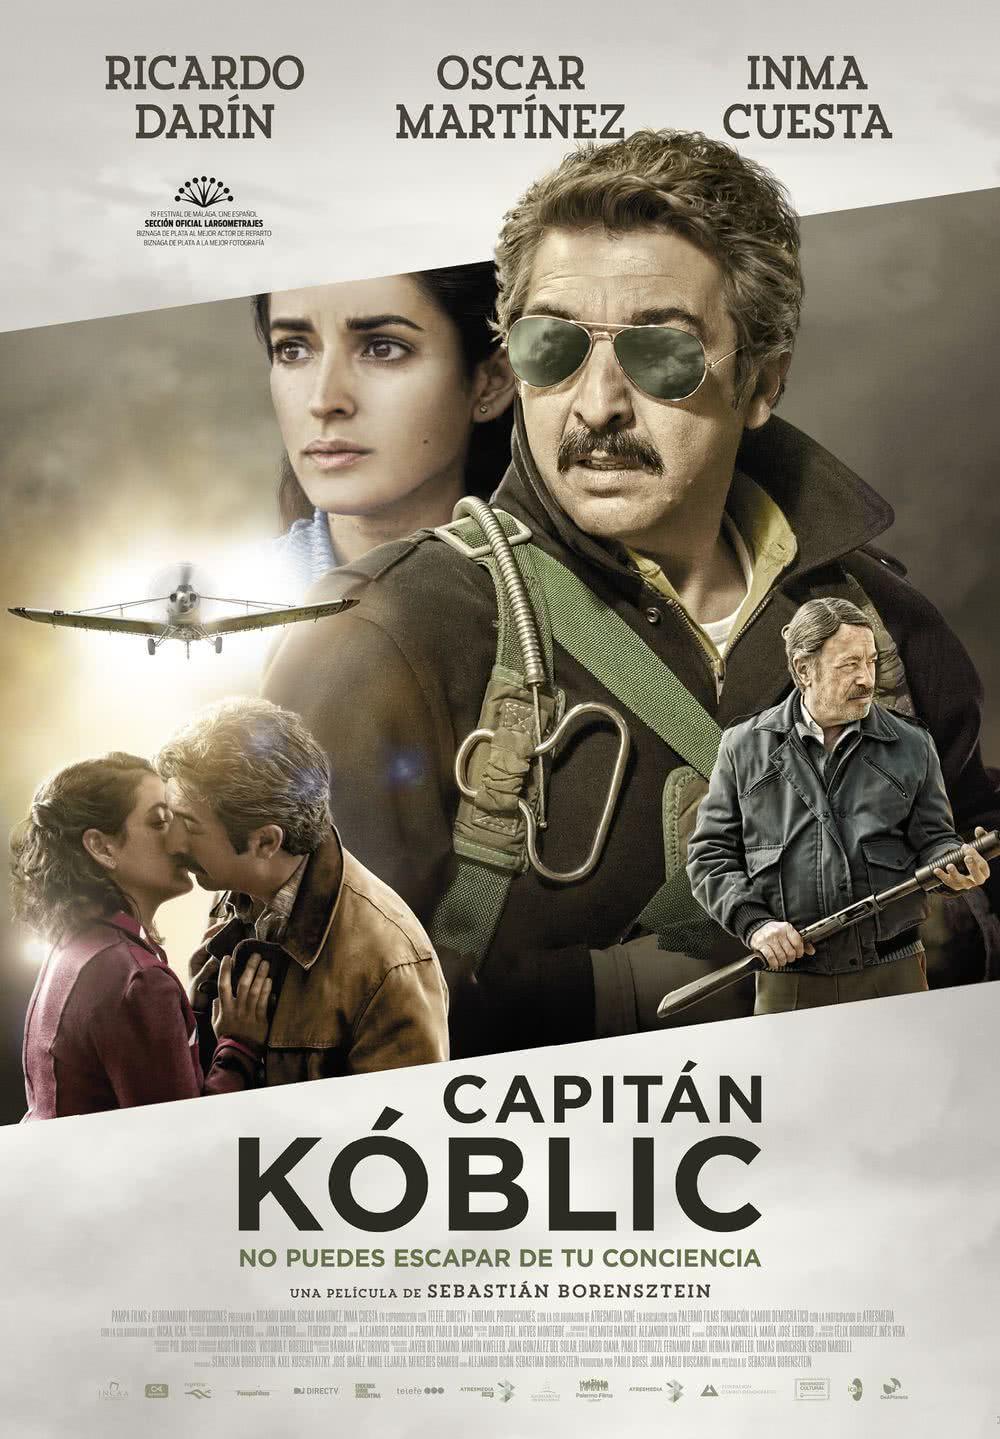 Capitan Koblic